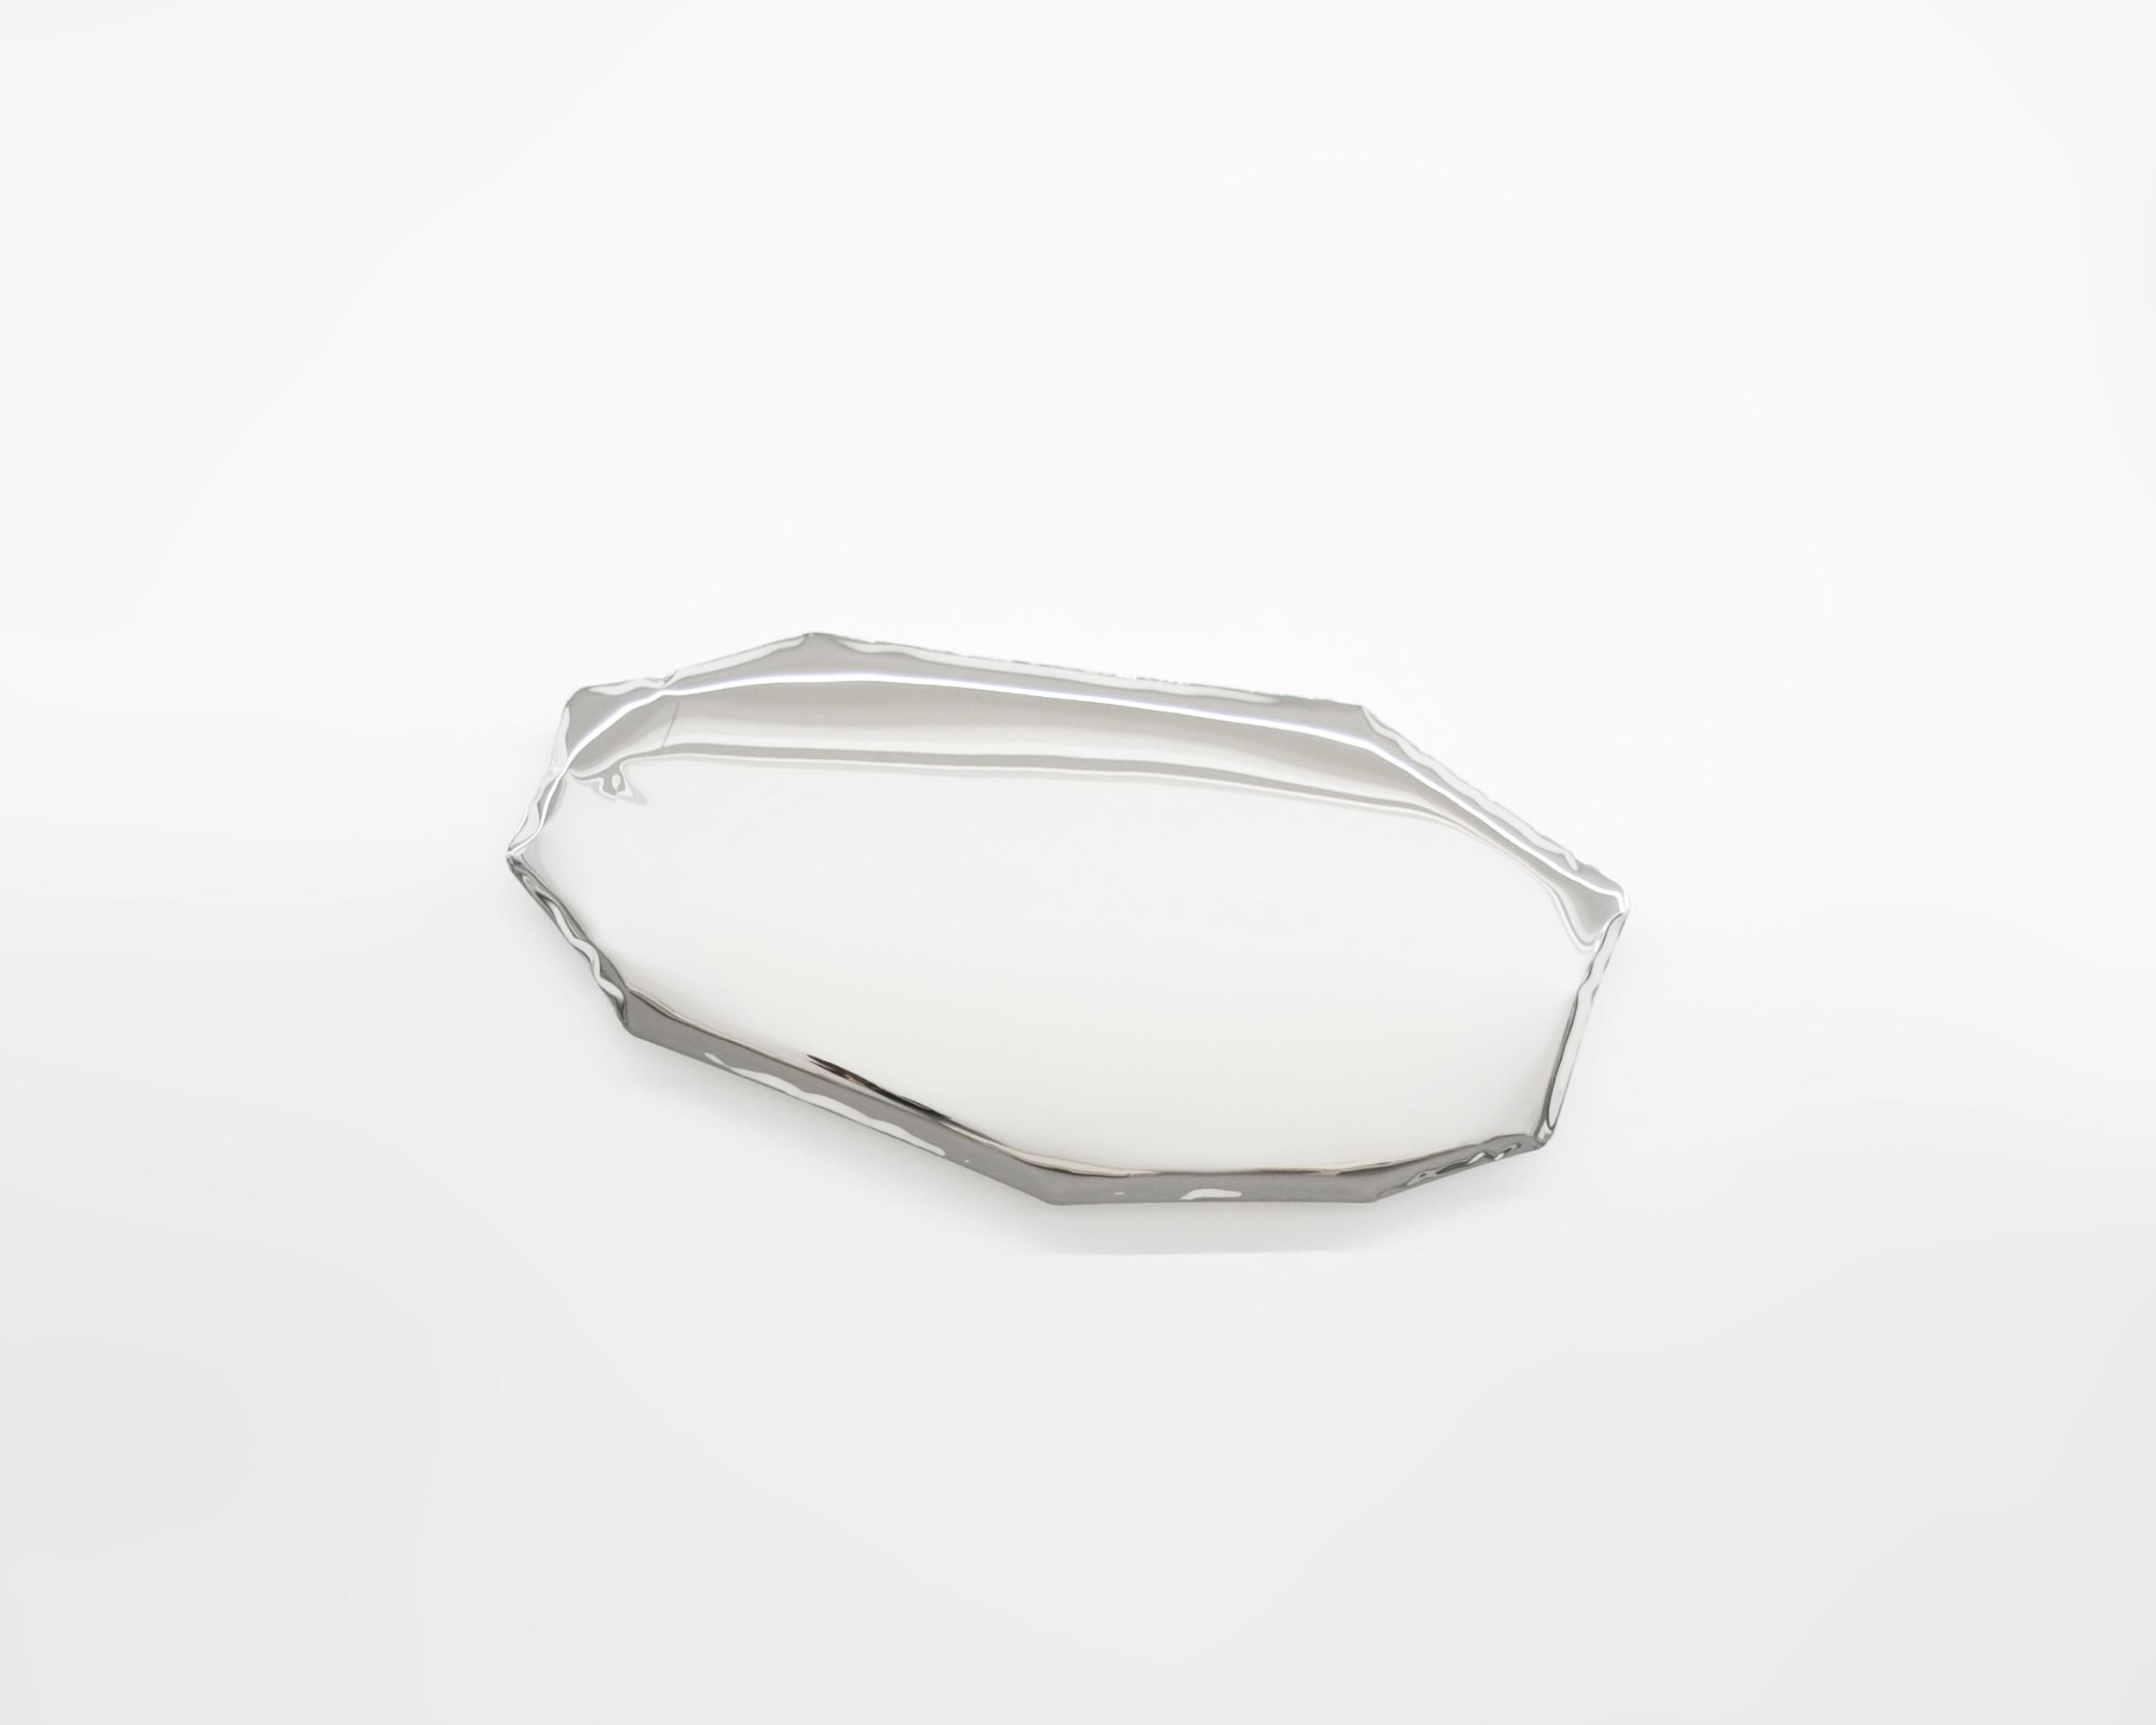 Zieta-Prozessdesign-Tafla-Mirror-Savannah-Bay-Gallery-2